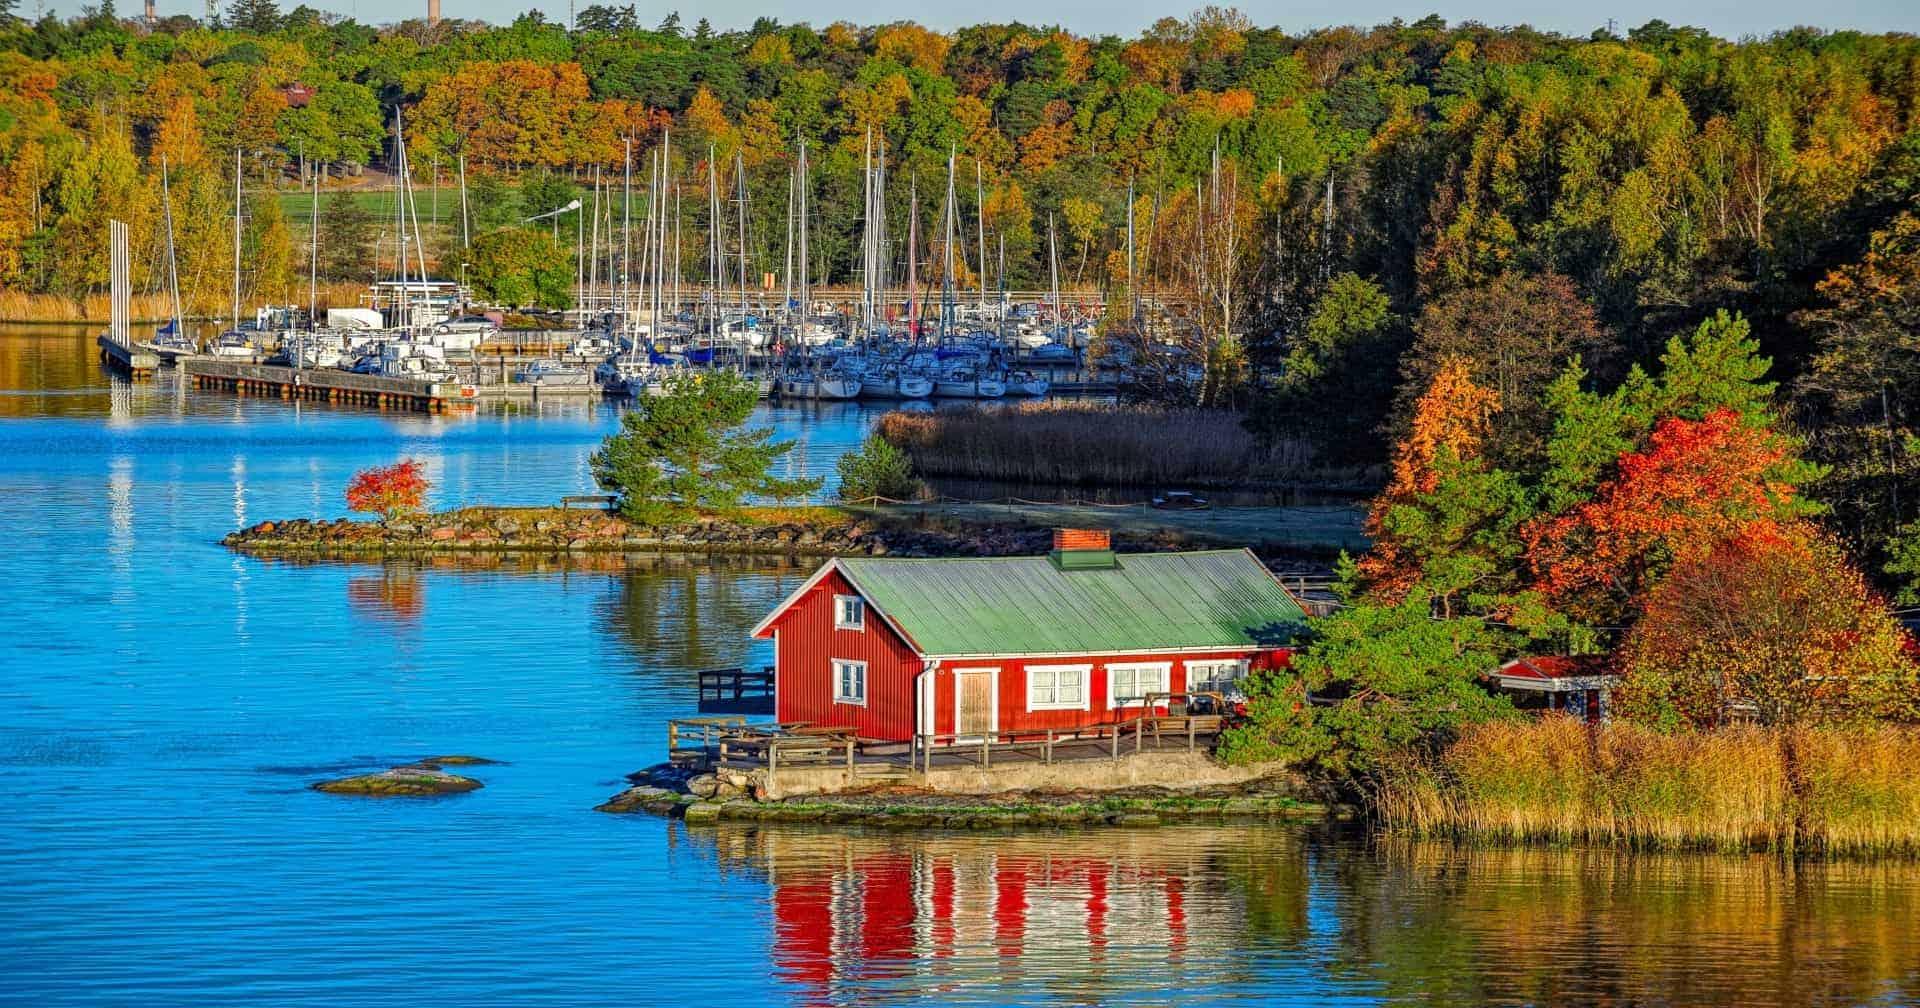 Ruissalo island Turku archipelago Turku Finland